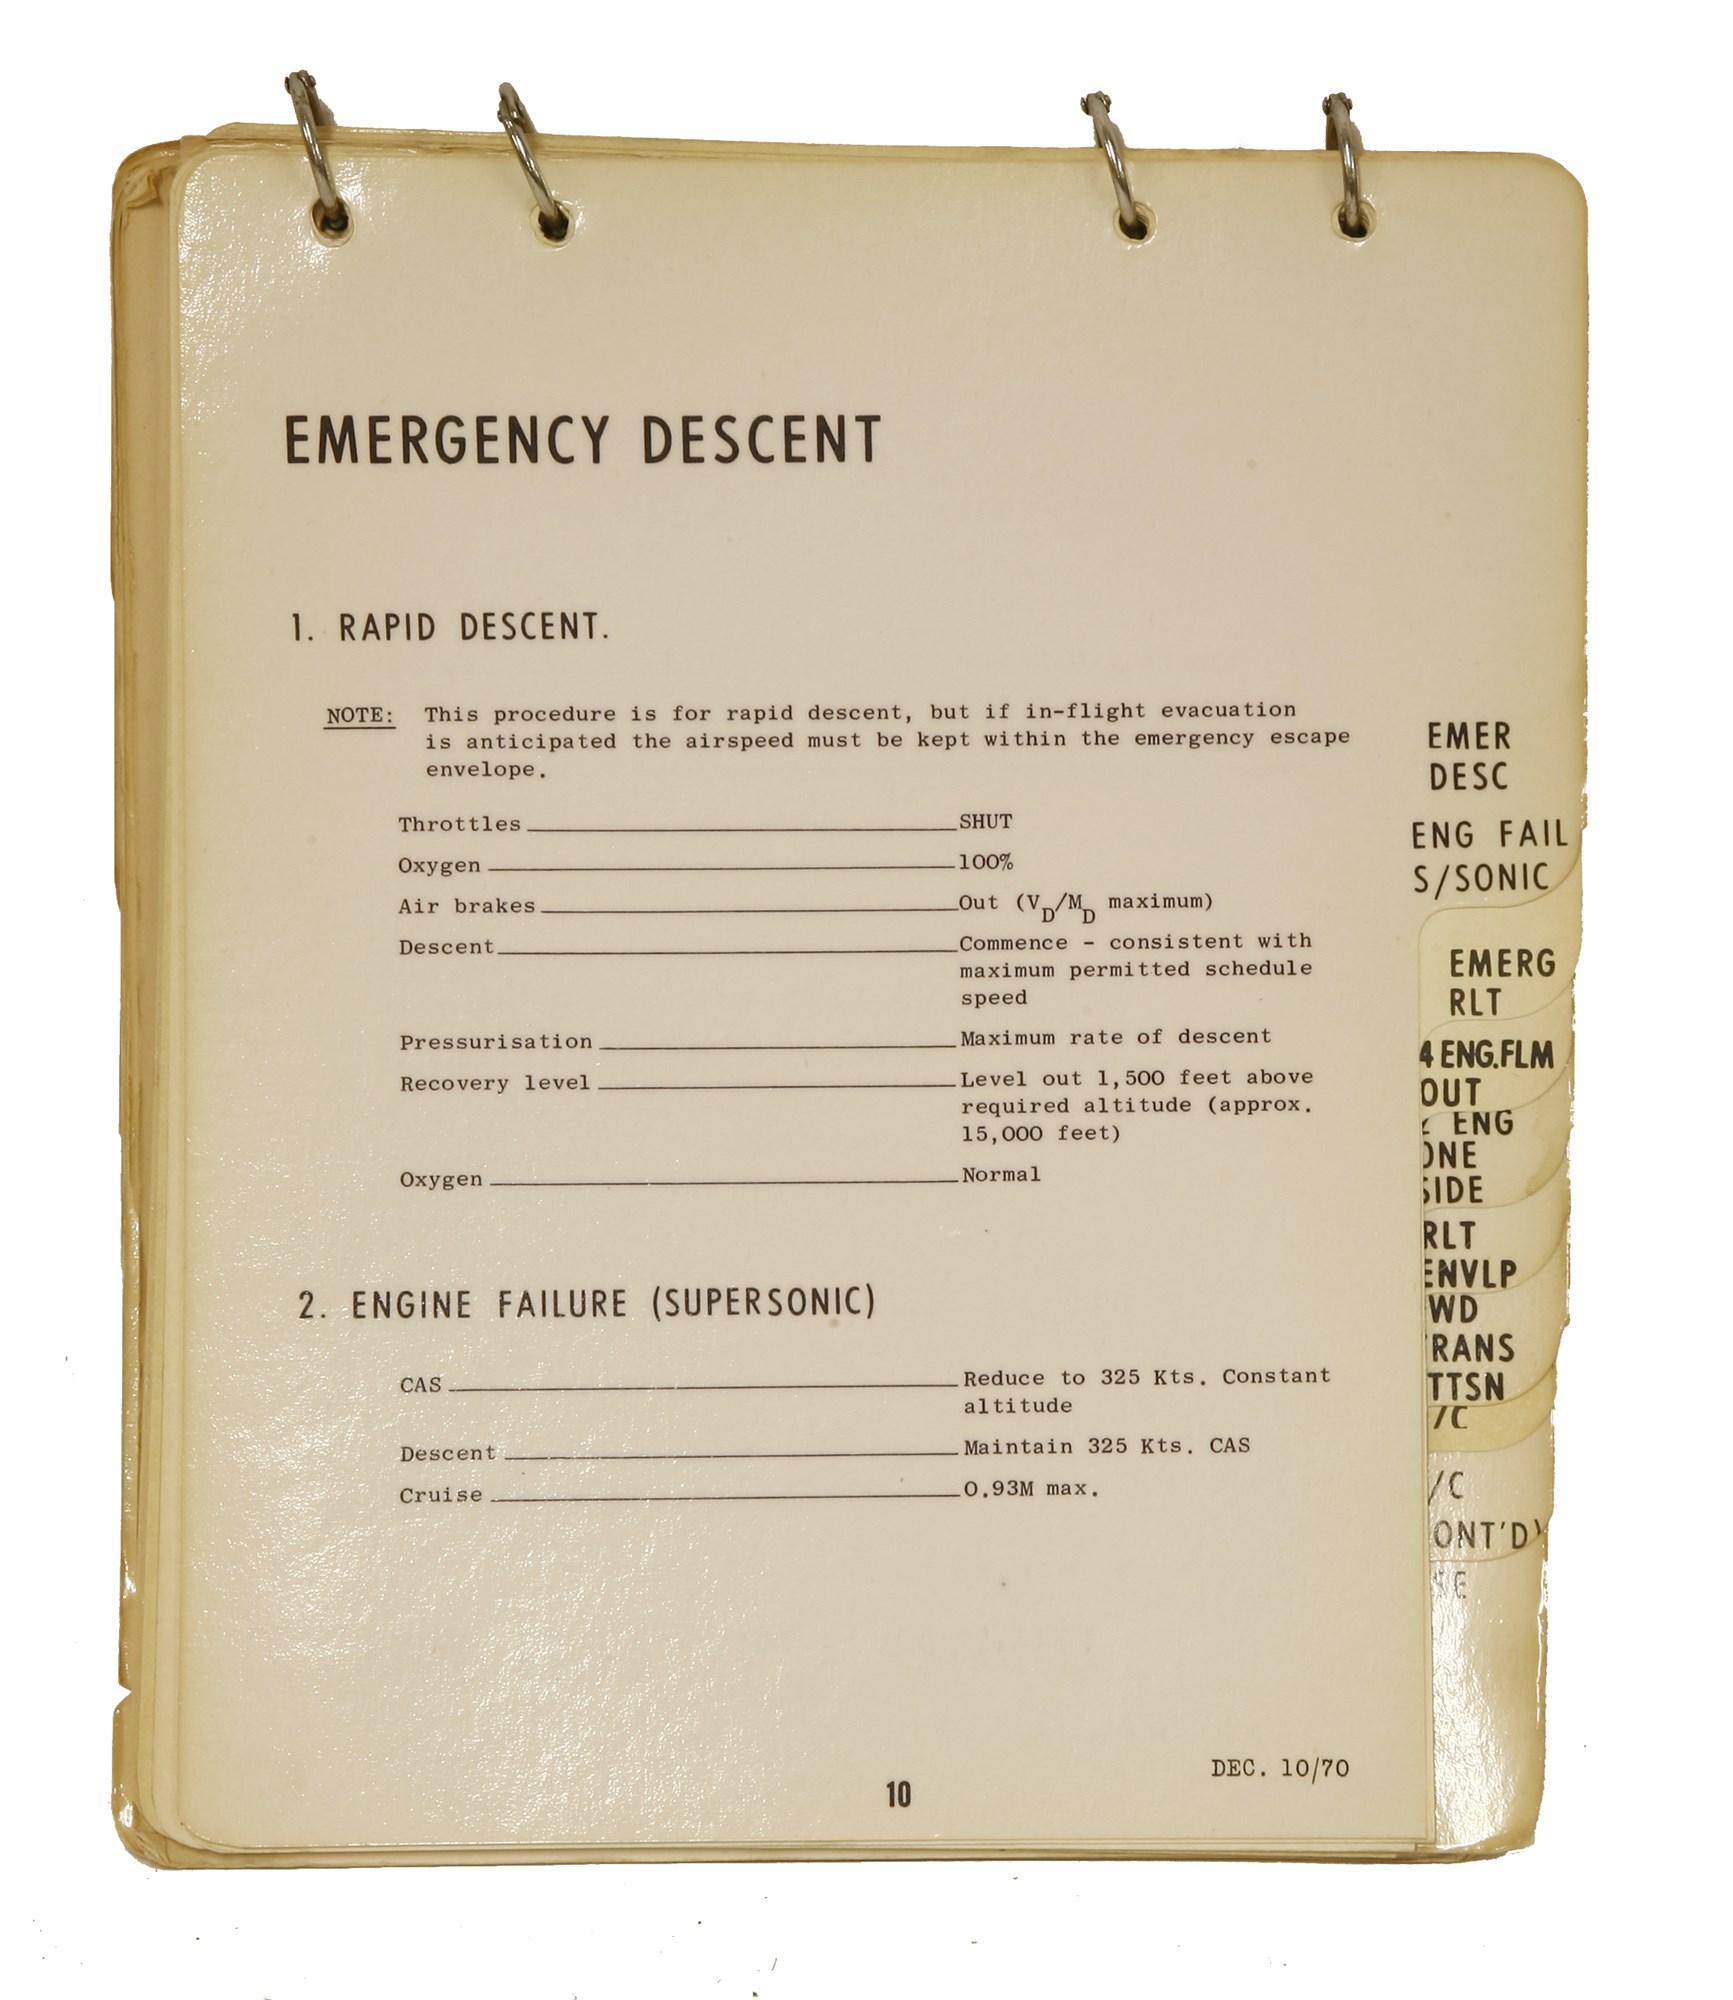 Concorde 002 'Emergency Procedures Manual' - The Tim Wonnacott Collection